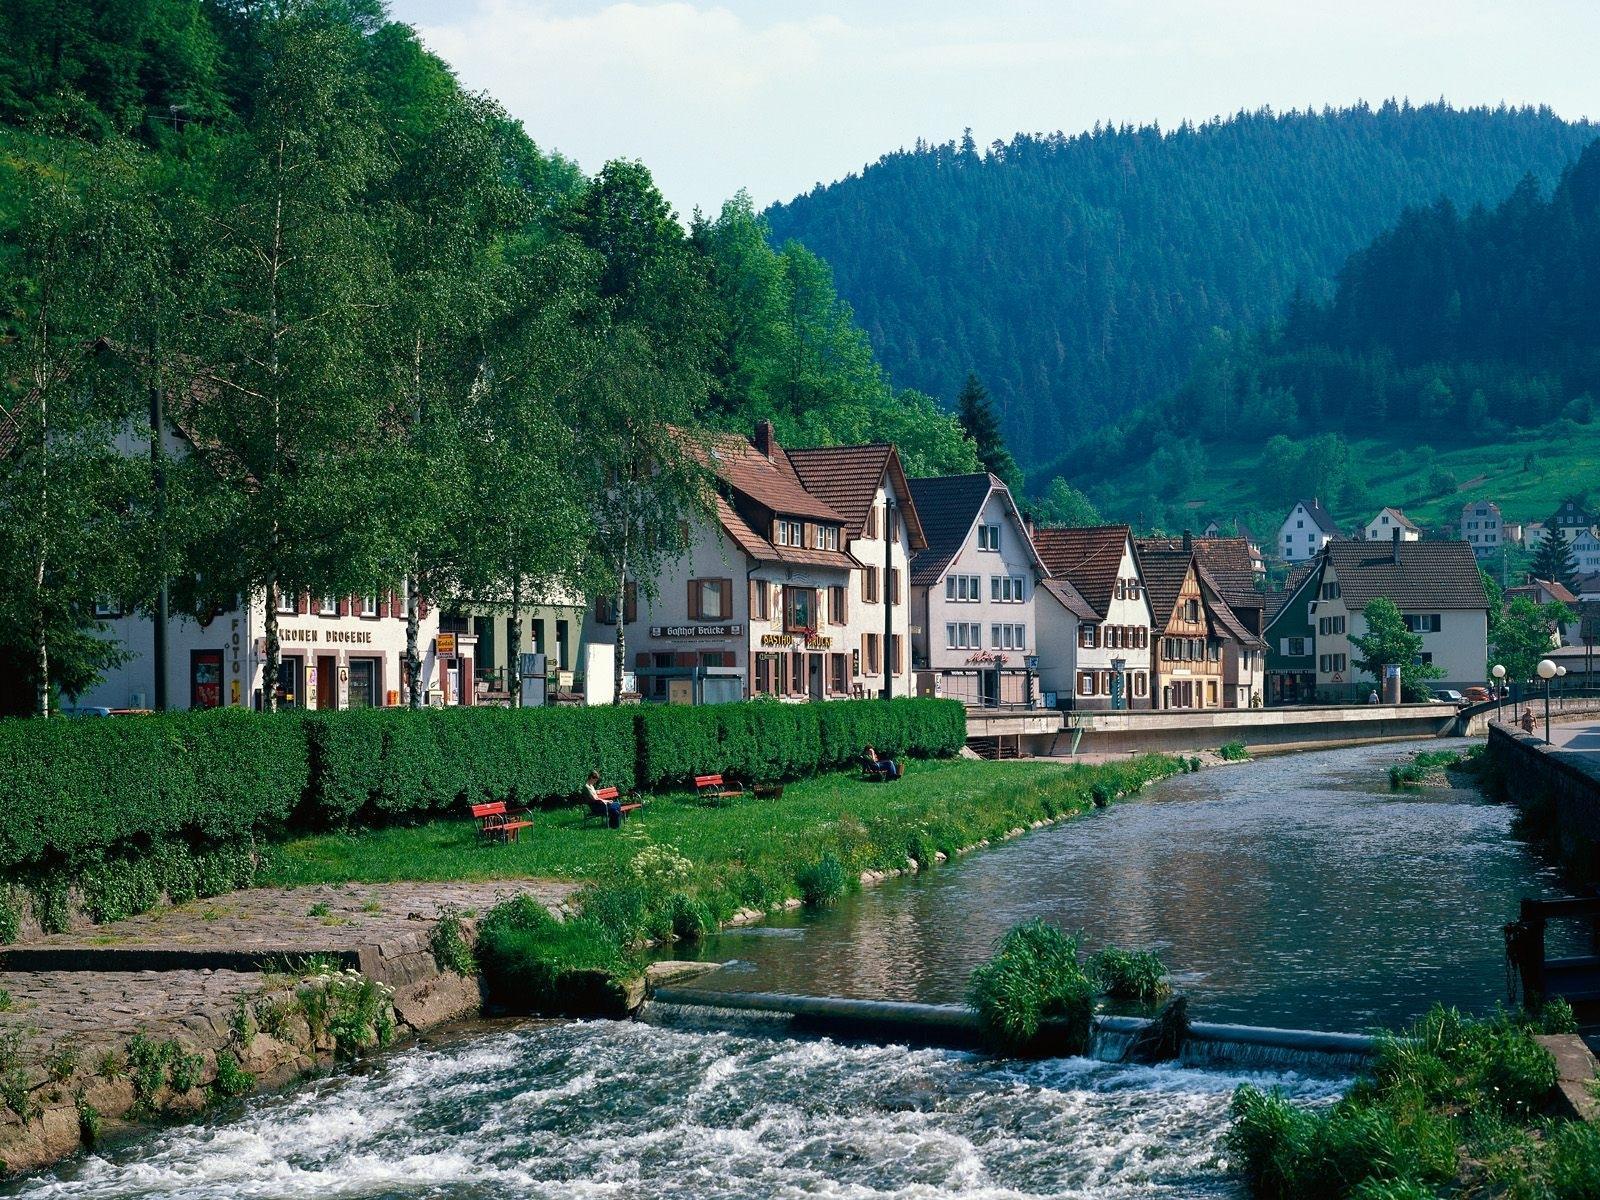 Lorch Village, Hesse, Rhine River, Germany  № 78237 загрузить